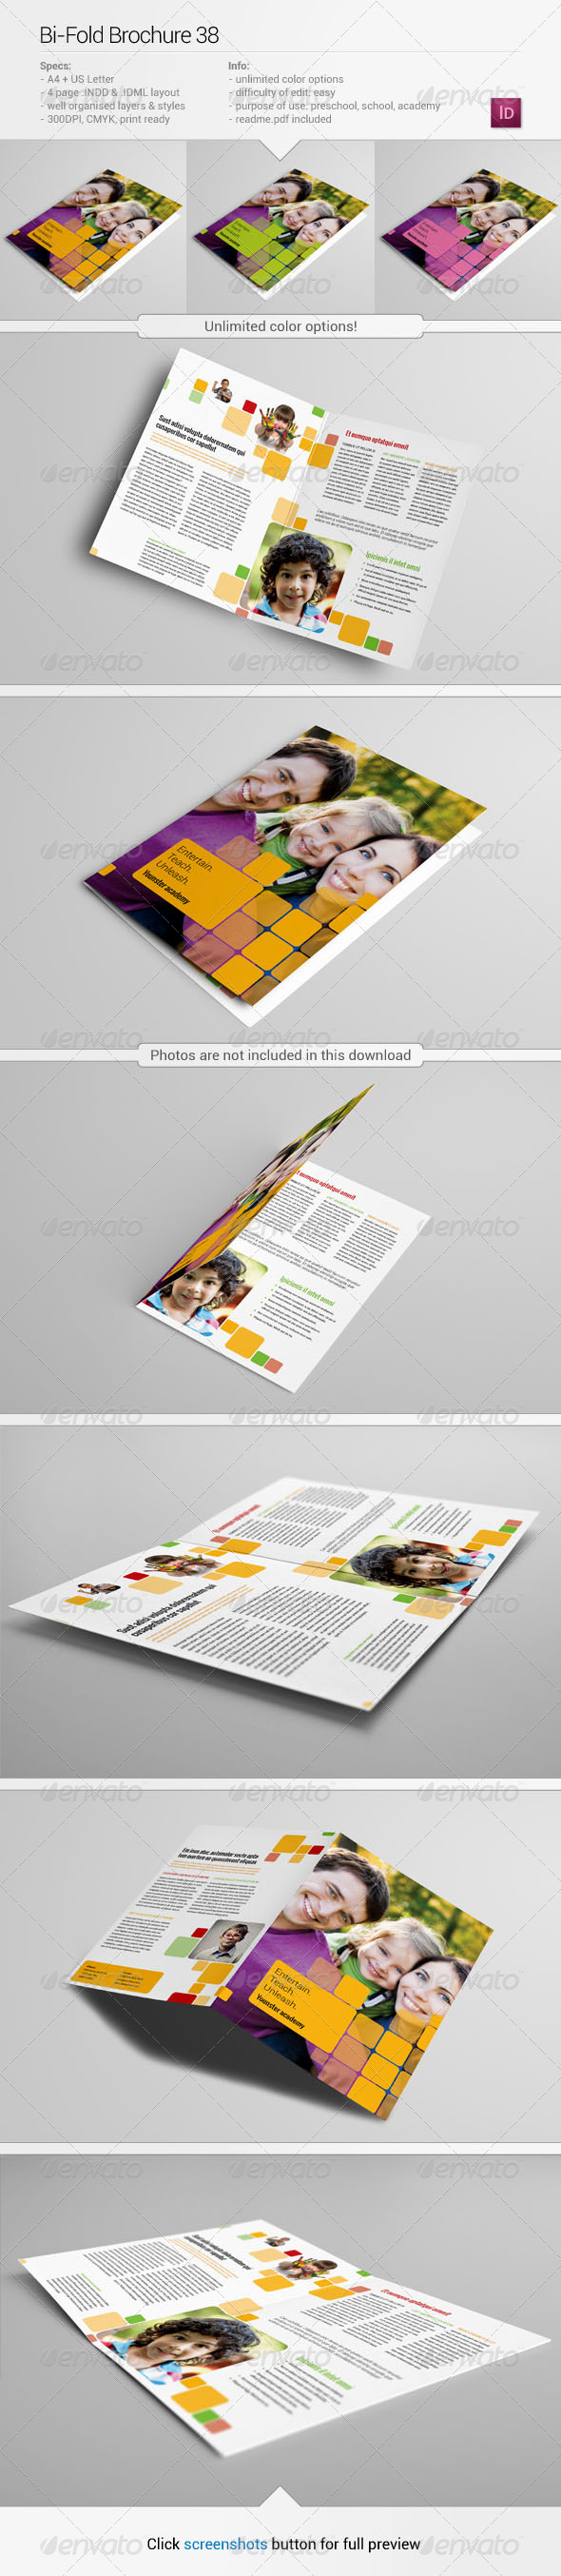 Bi-Fold Brochure 38